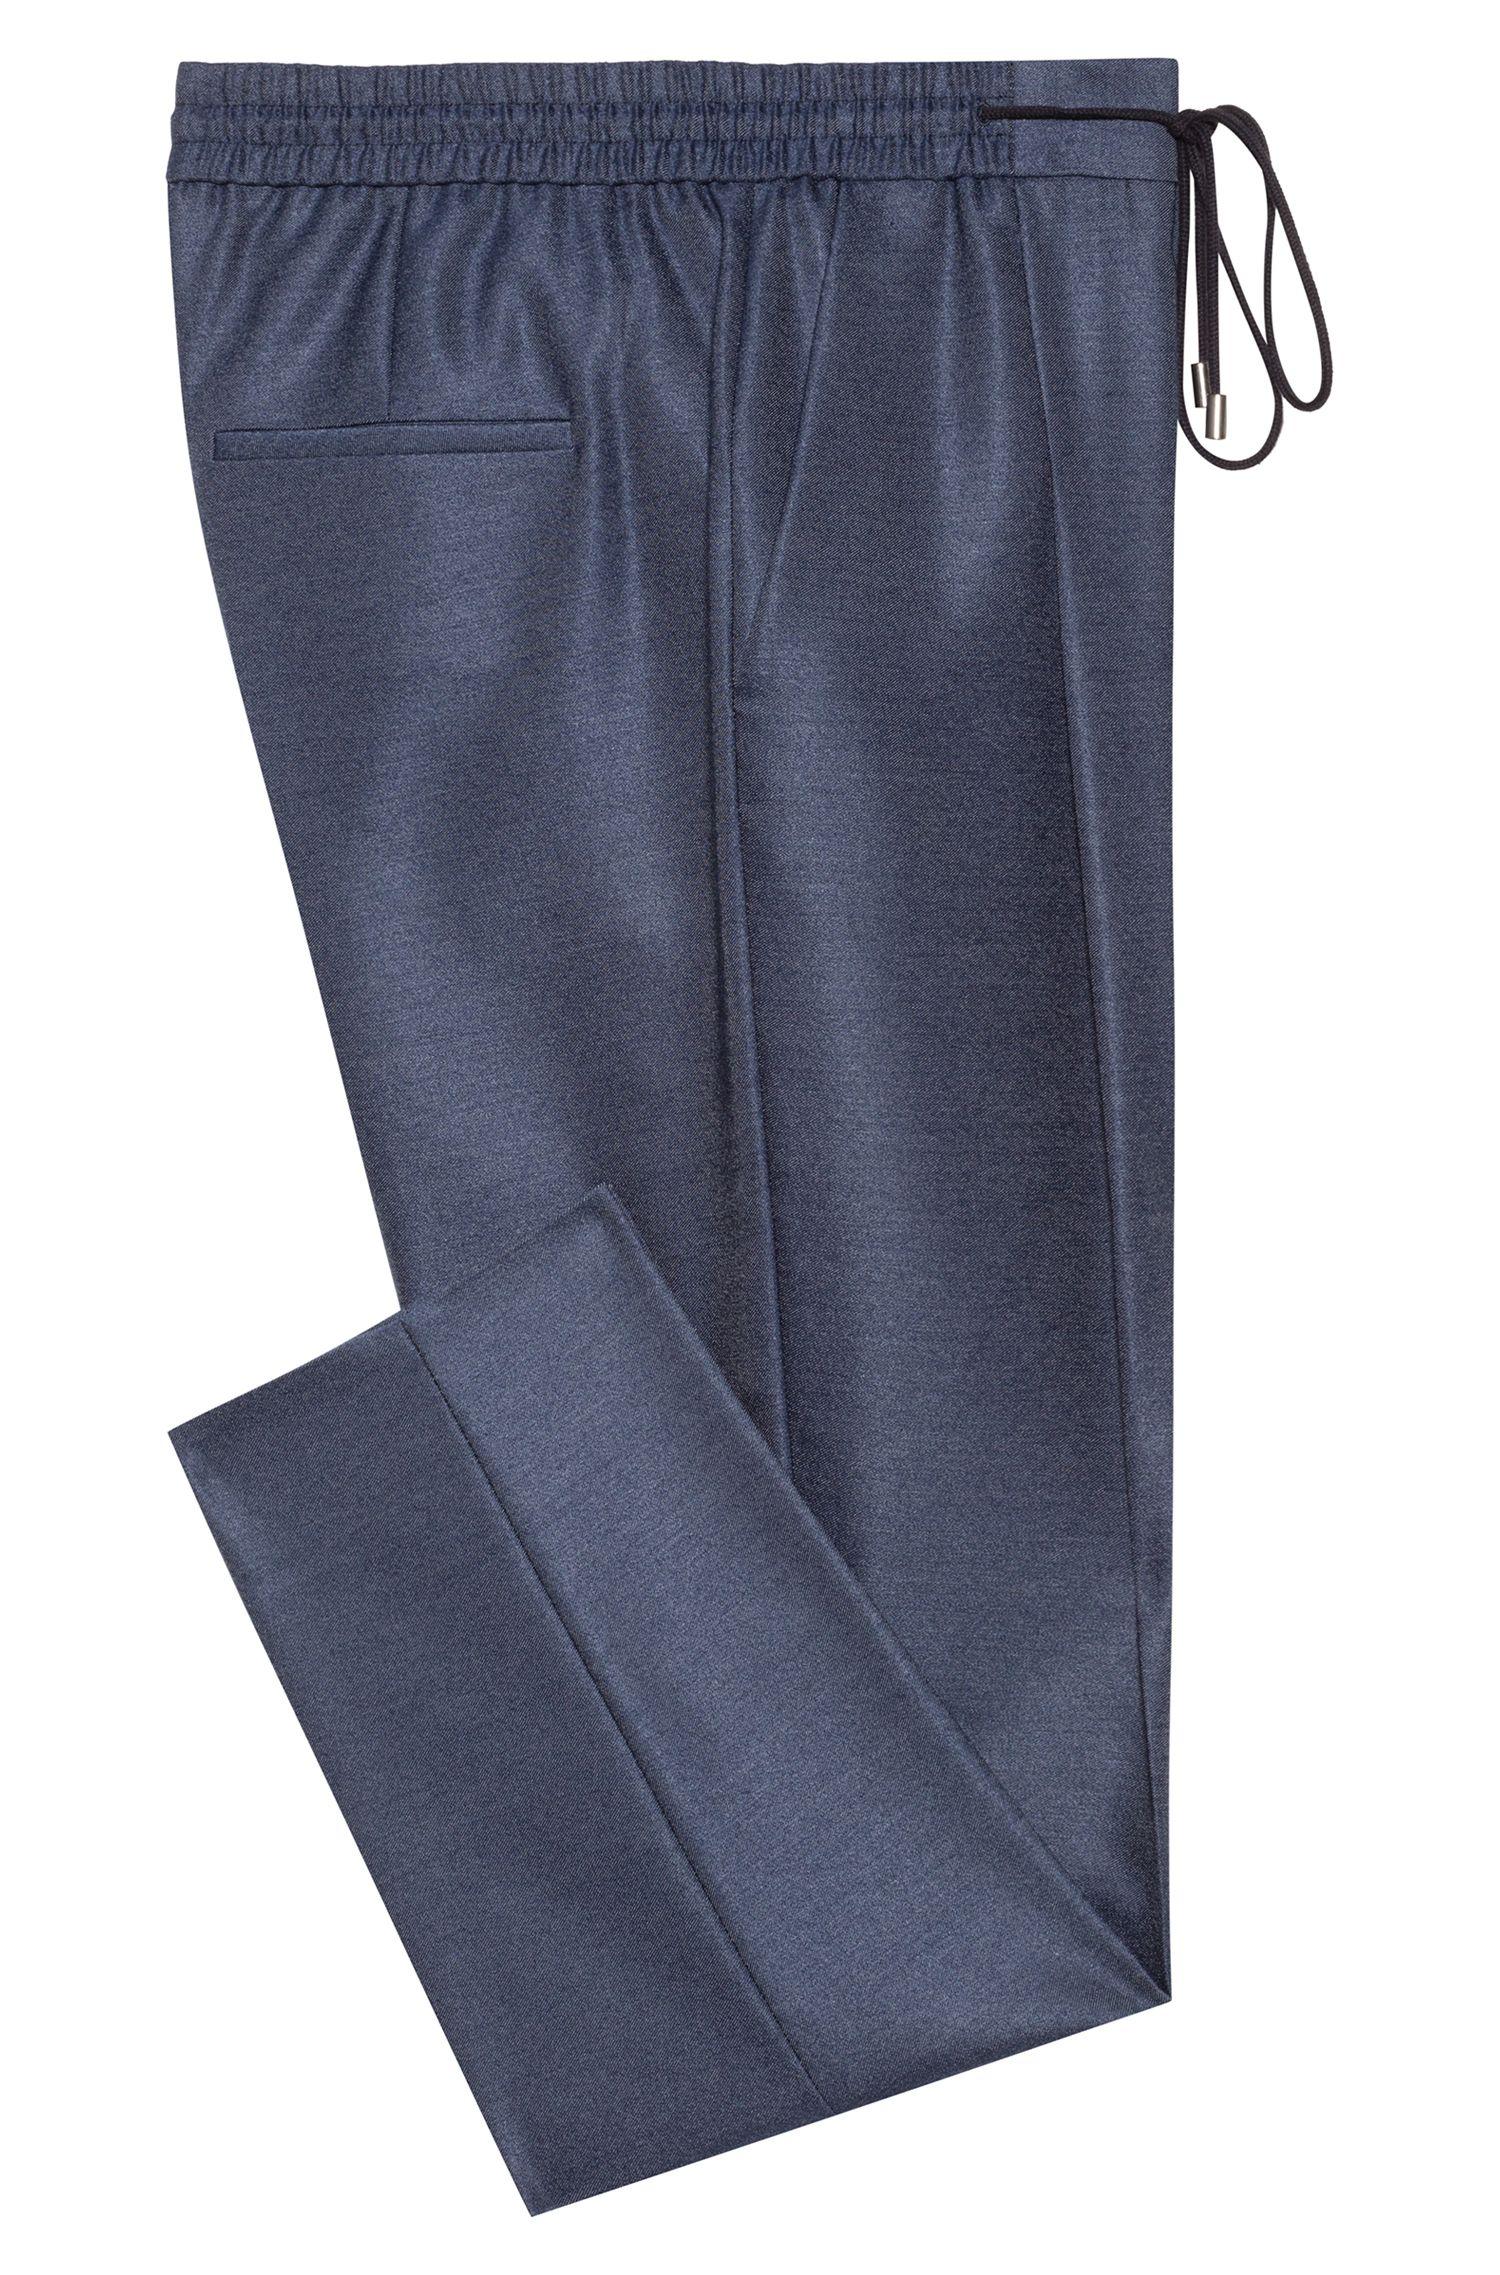 Hugo Boss - Pantalon Relaxed Fit en tissu stretch à taille avec cordon de serrage - 4